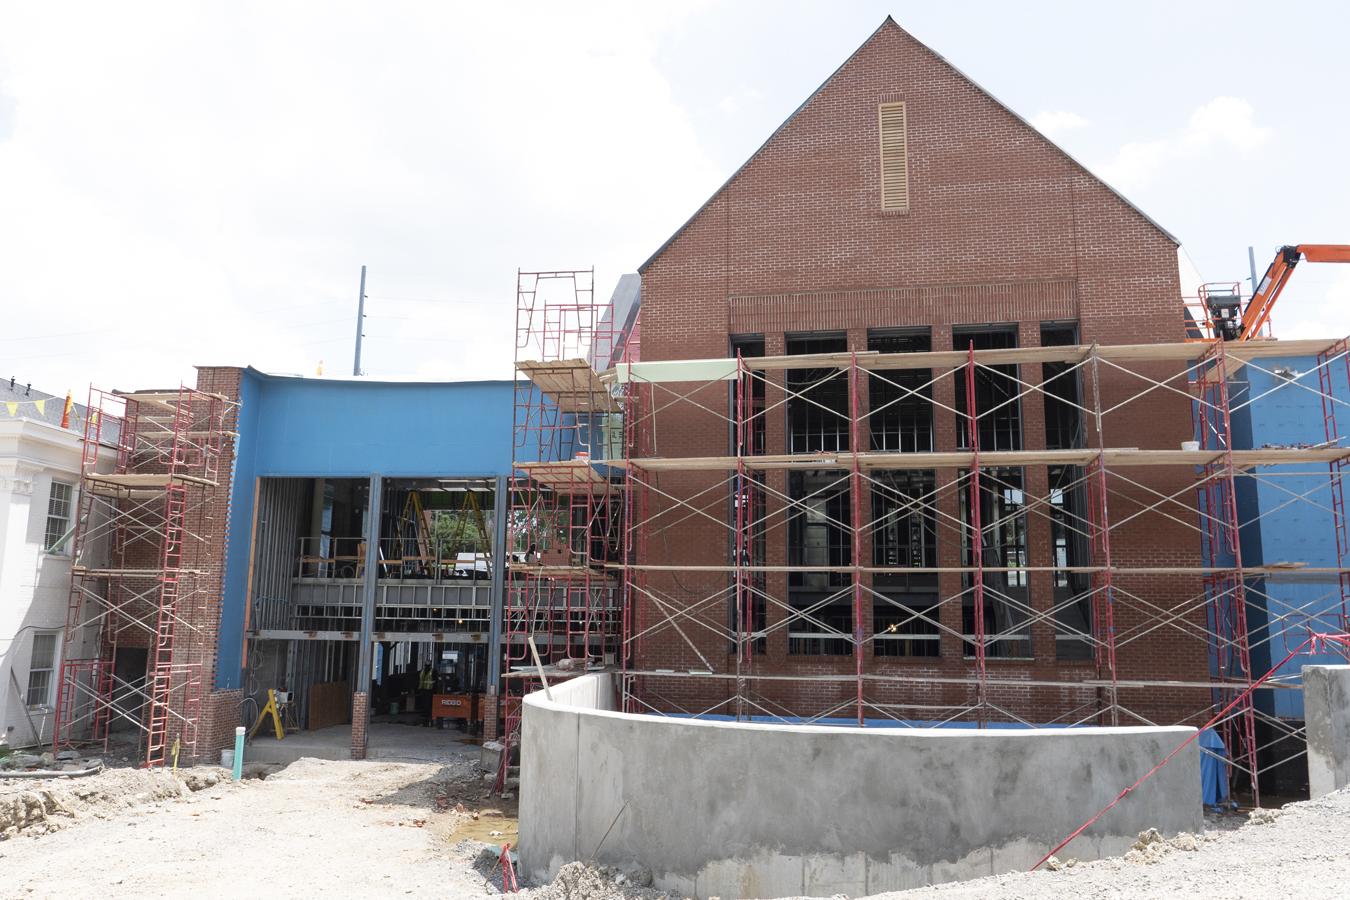 July 14 construction photos